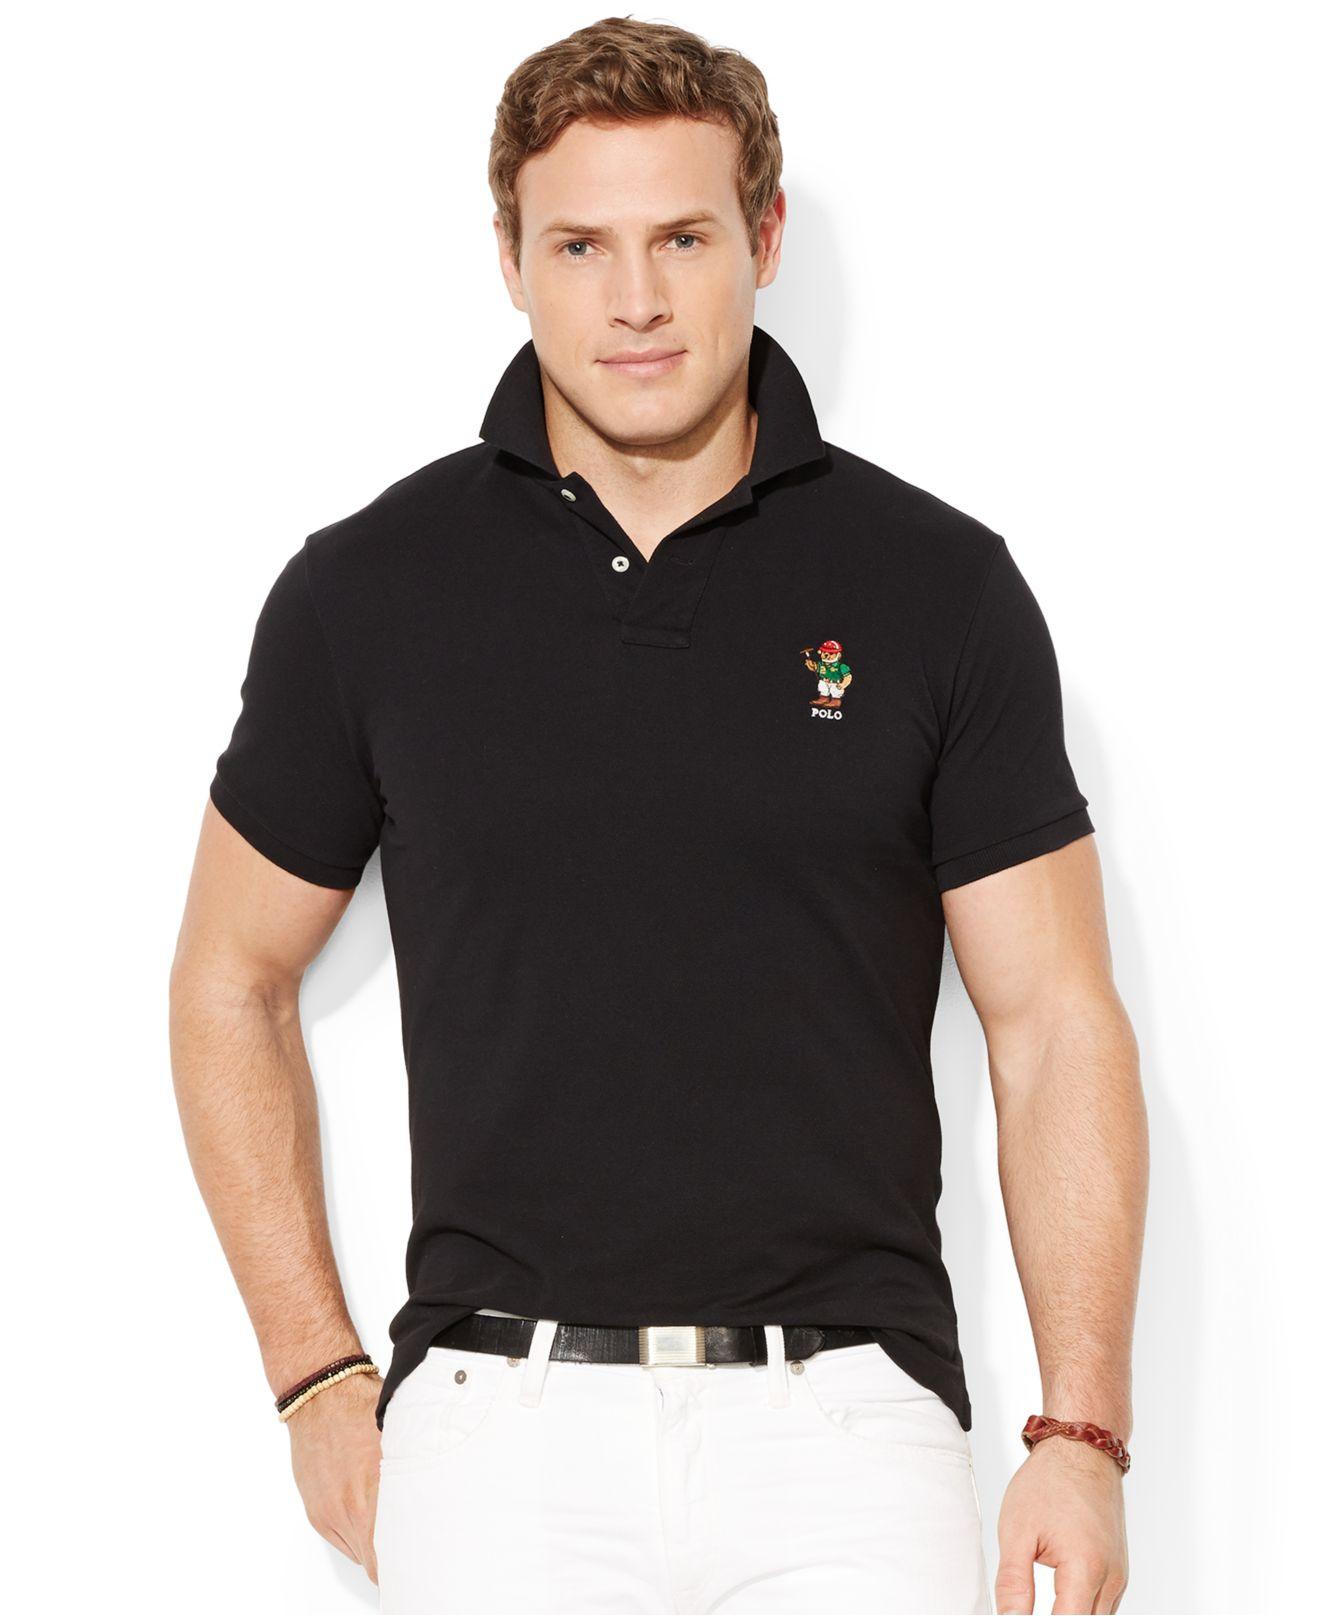 Ralph Lauren Dri Fit Polo Shirts Bcd Tofu House